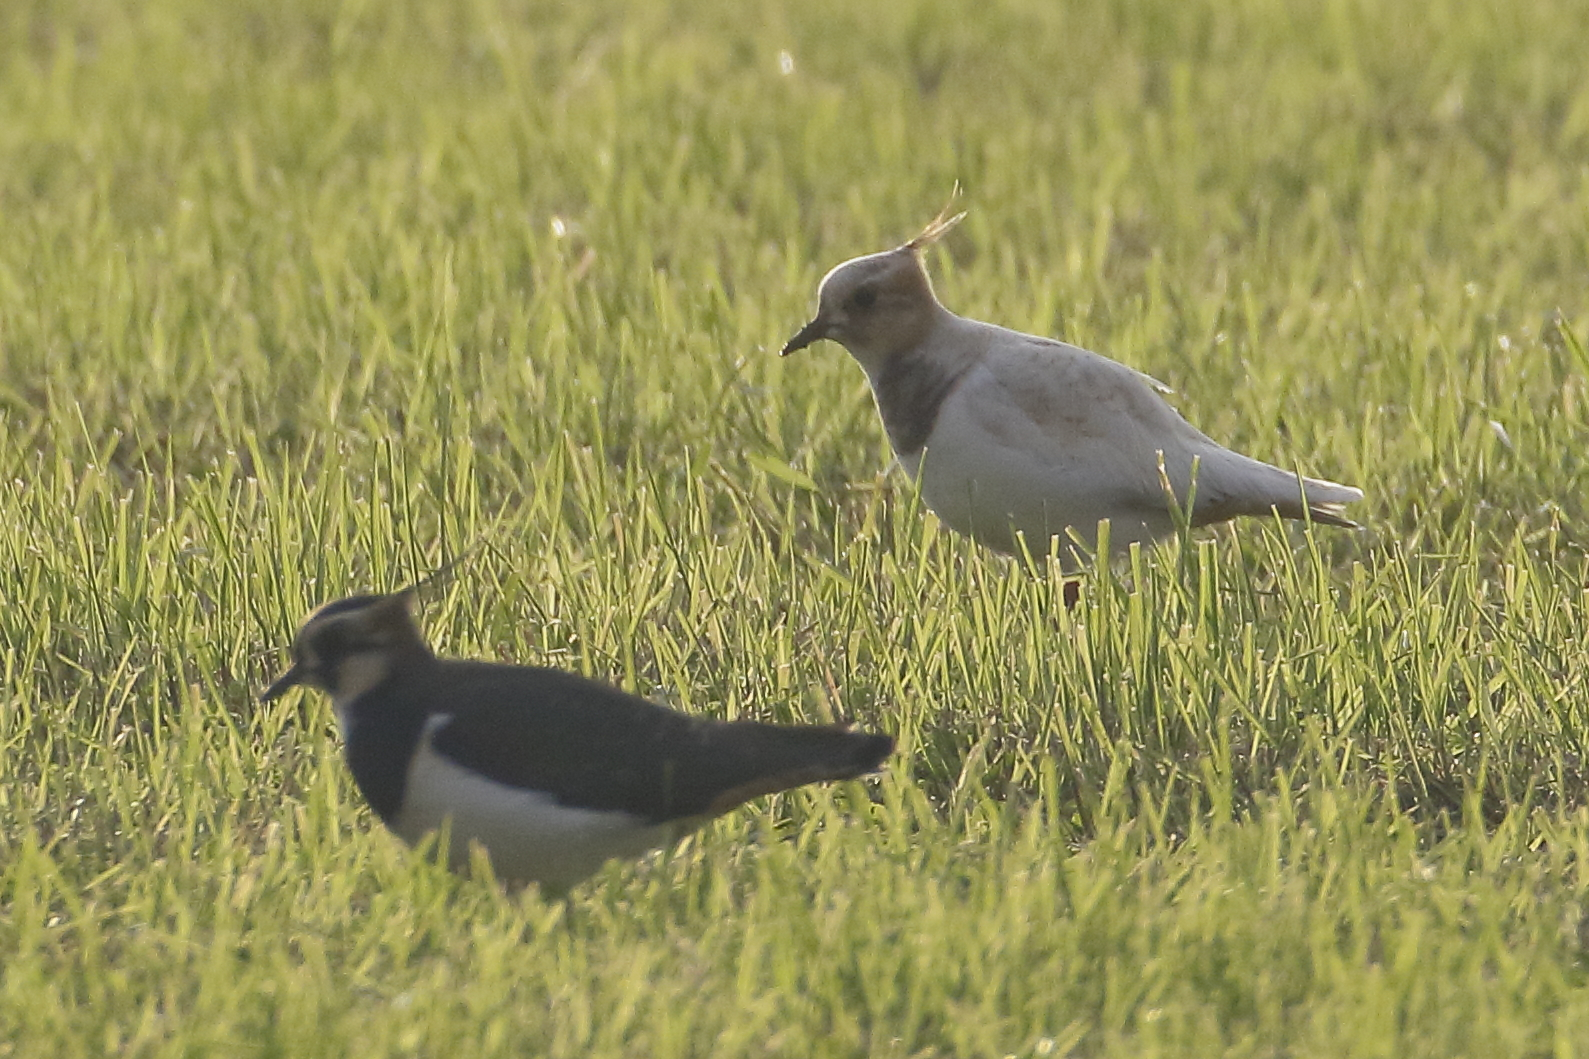 Kievit in het gras VVV Texel fotograaf Marc Plomp